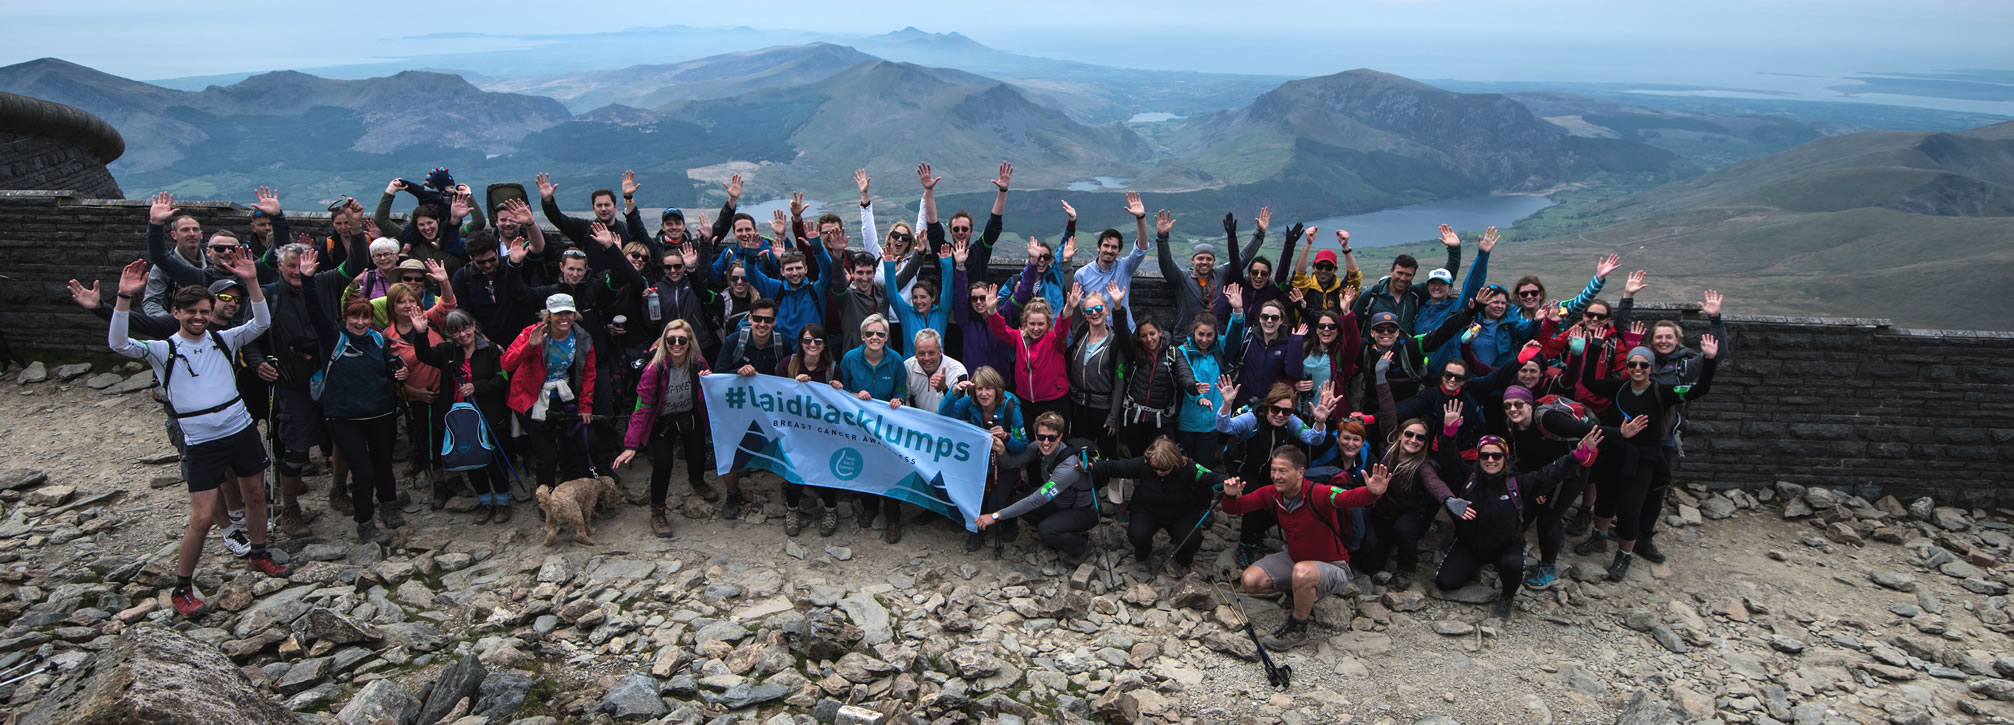 Climb Snowdon - #LaidBackLumps